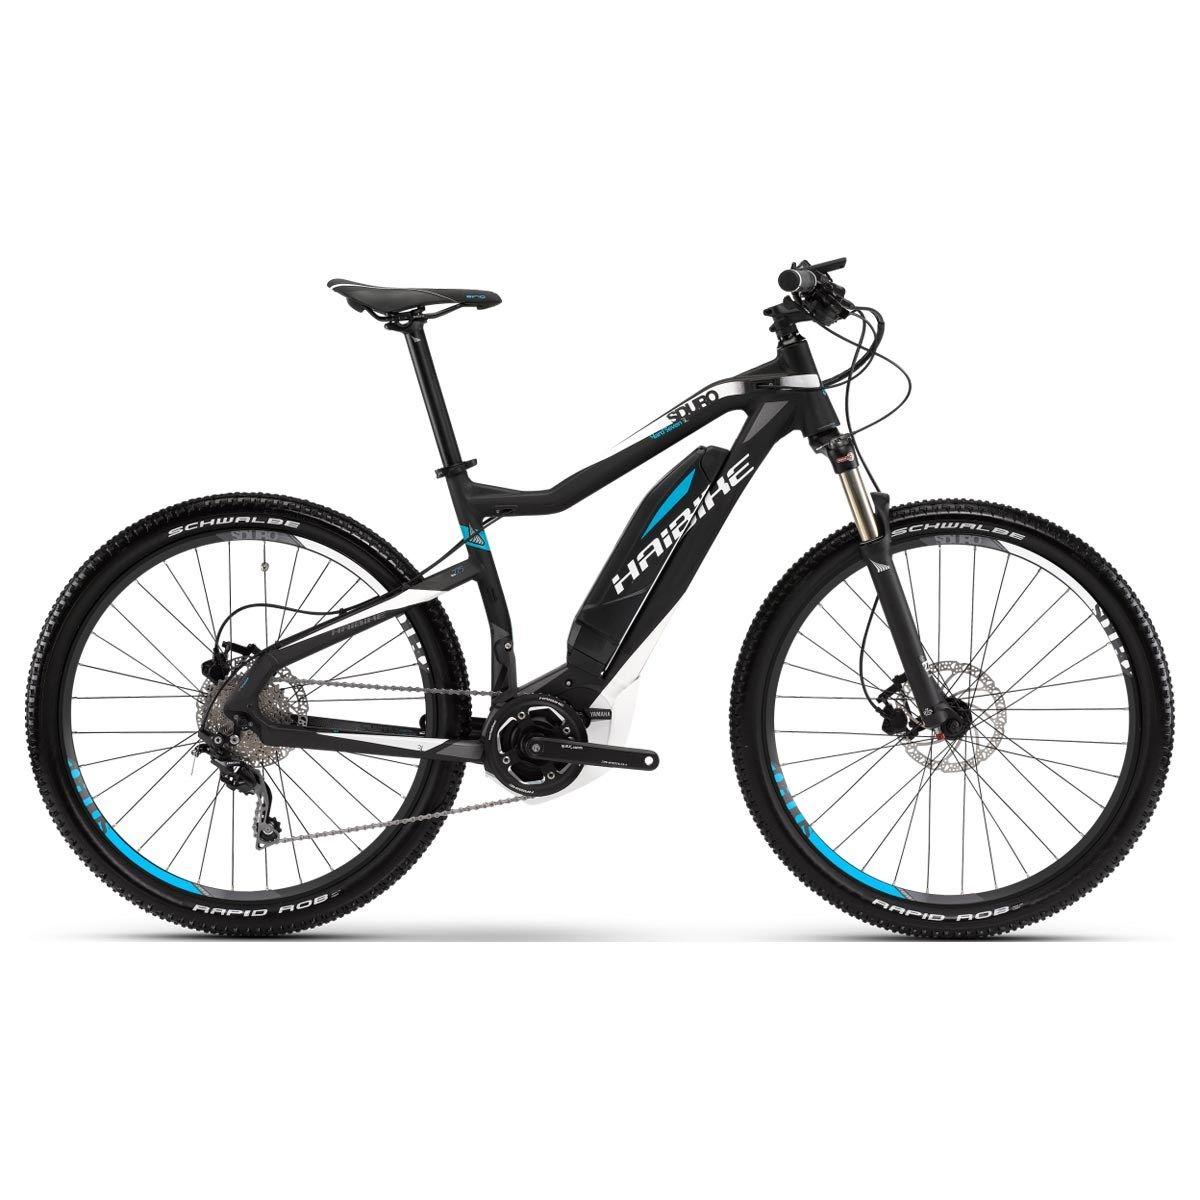 2016 Haibike Sduro Hard Seven Sl Electric Hardtail Mountain Bike